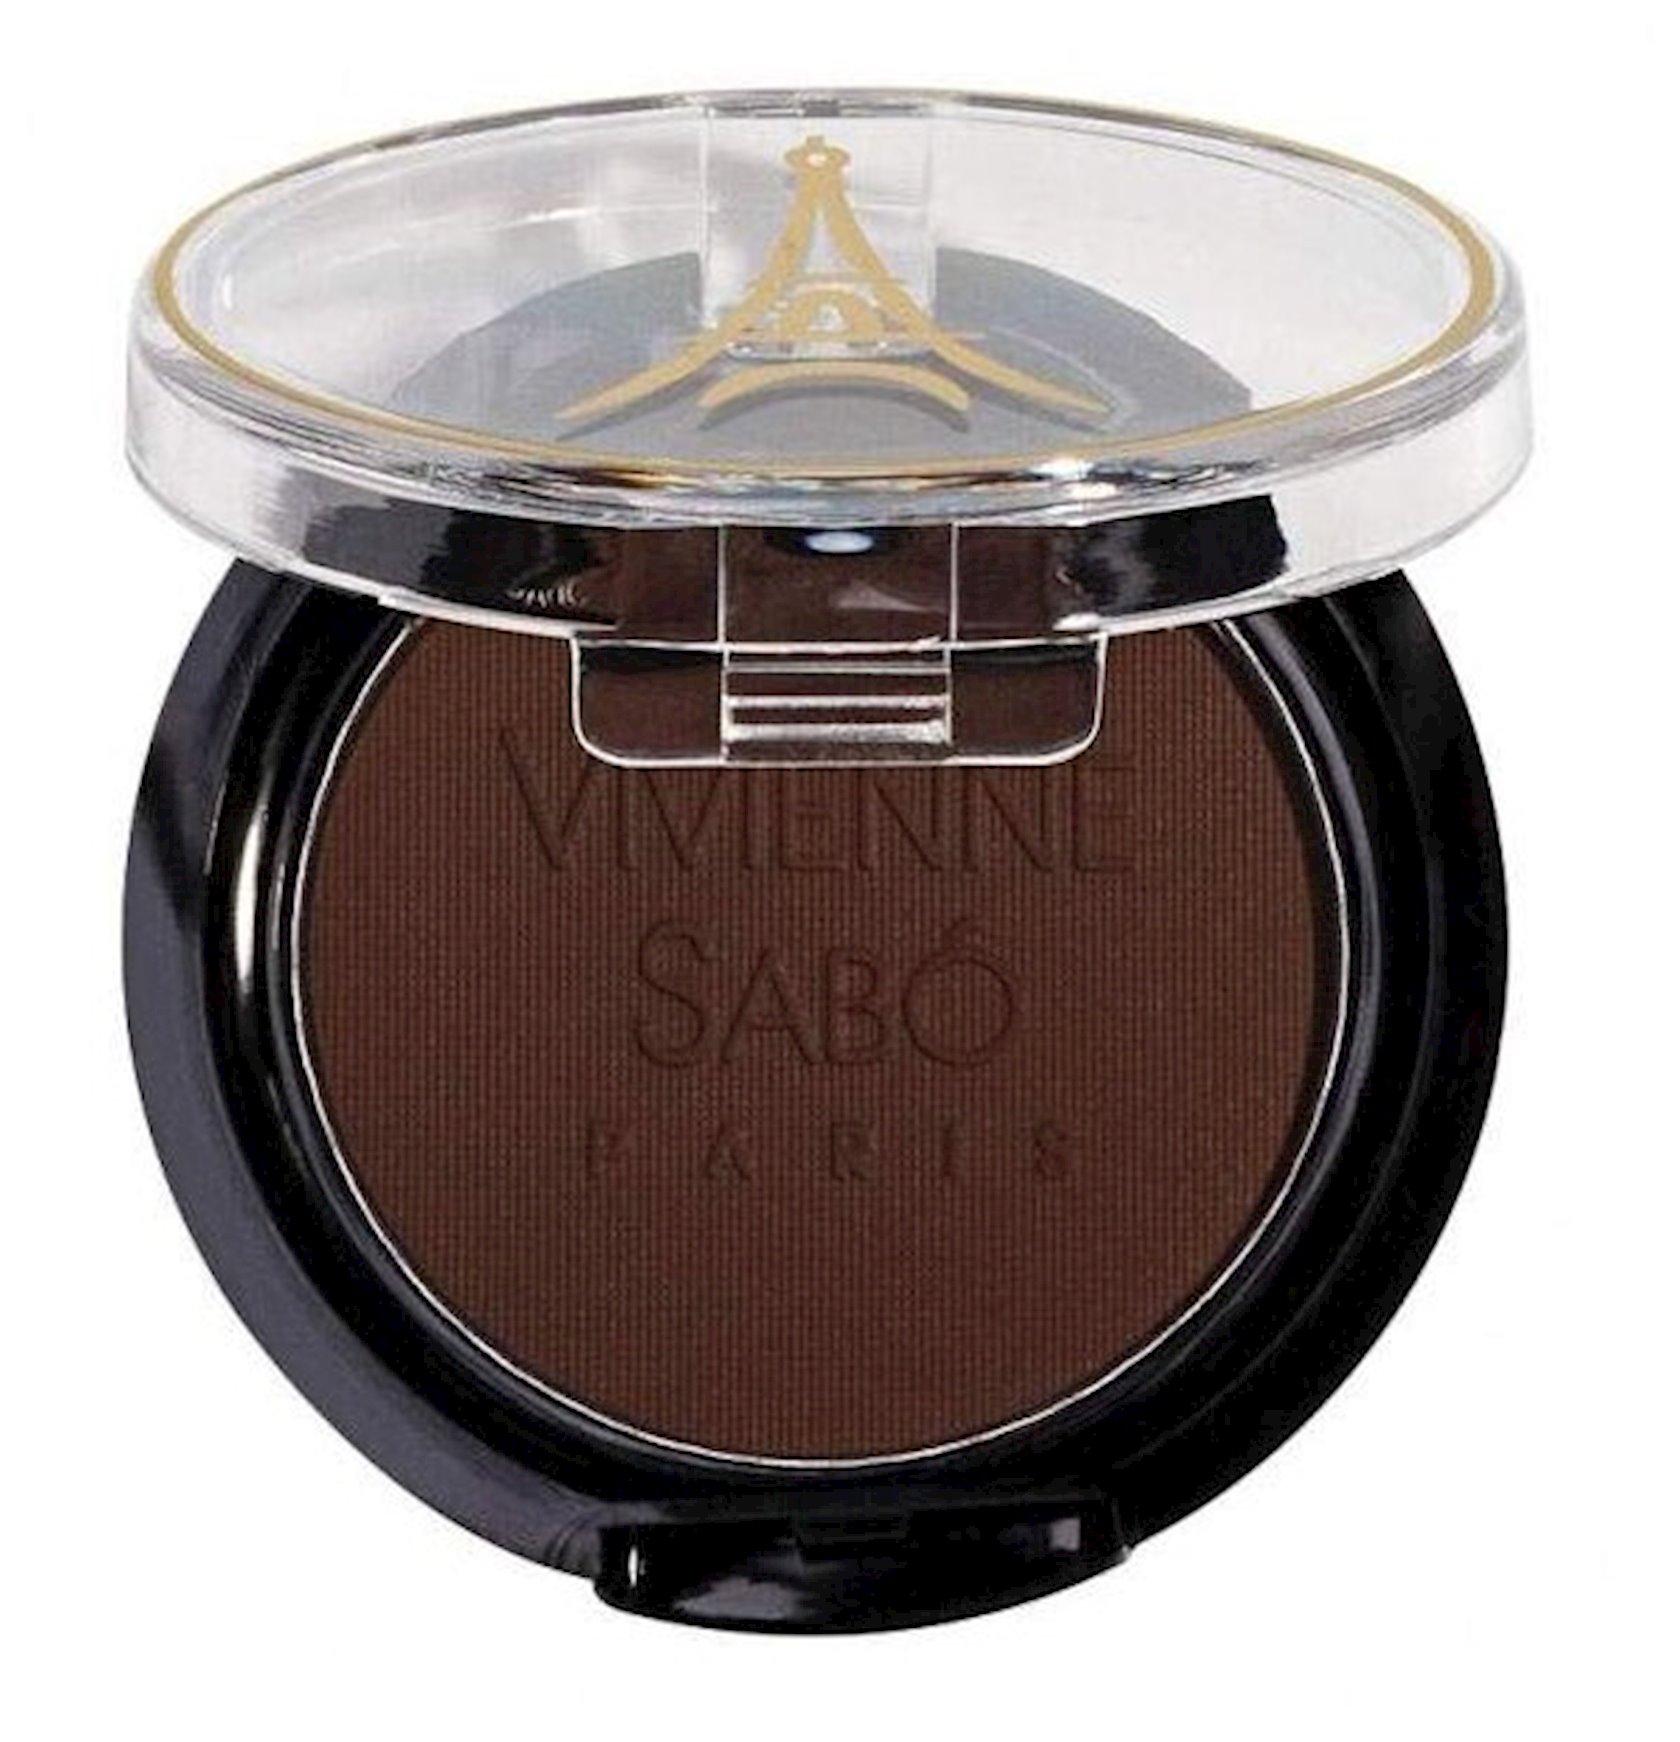 Göz kölgəsi Vivienne Sabo Petits Jeux 116